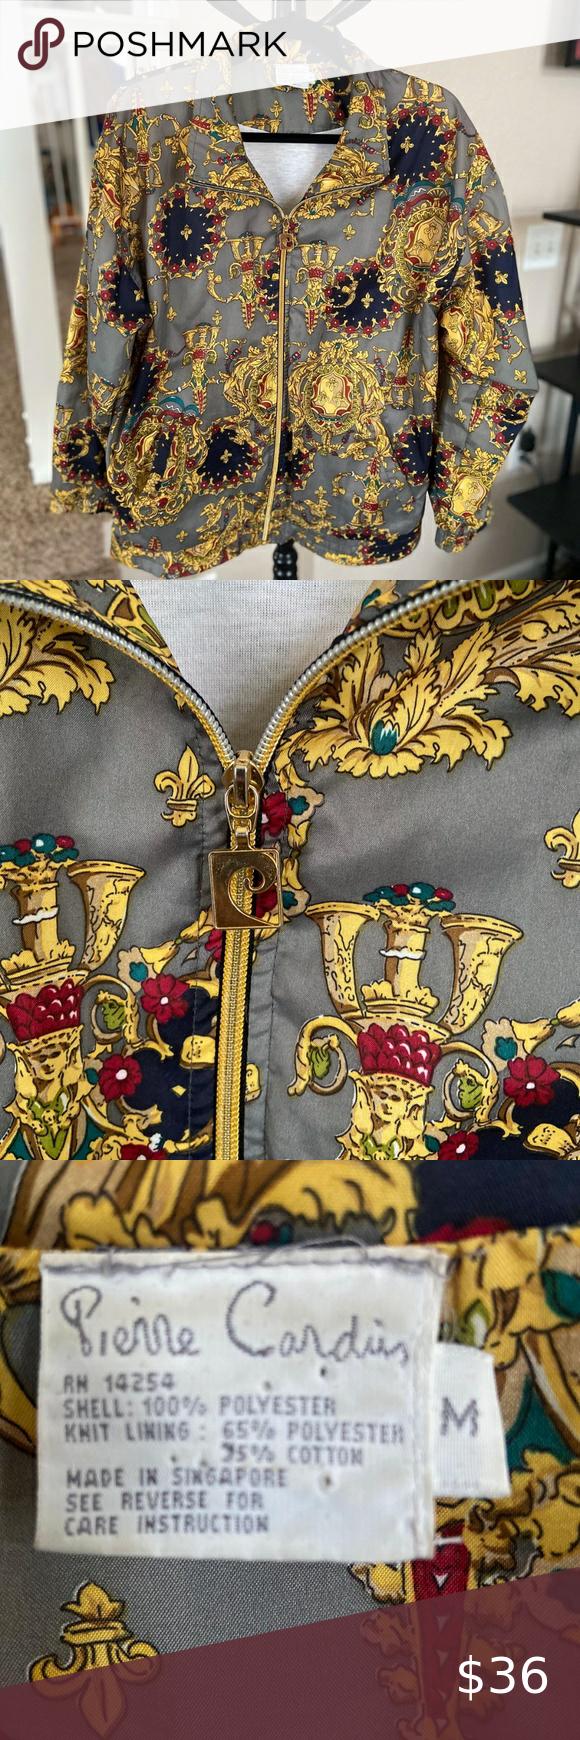 Vintage Paisley Bomber Jacket Outerwear Outerwear Jackets Bomber Jacket Jackets For Women [ 1740 x 580 Pixel ]